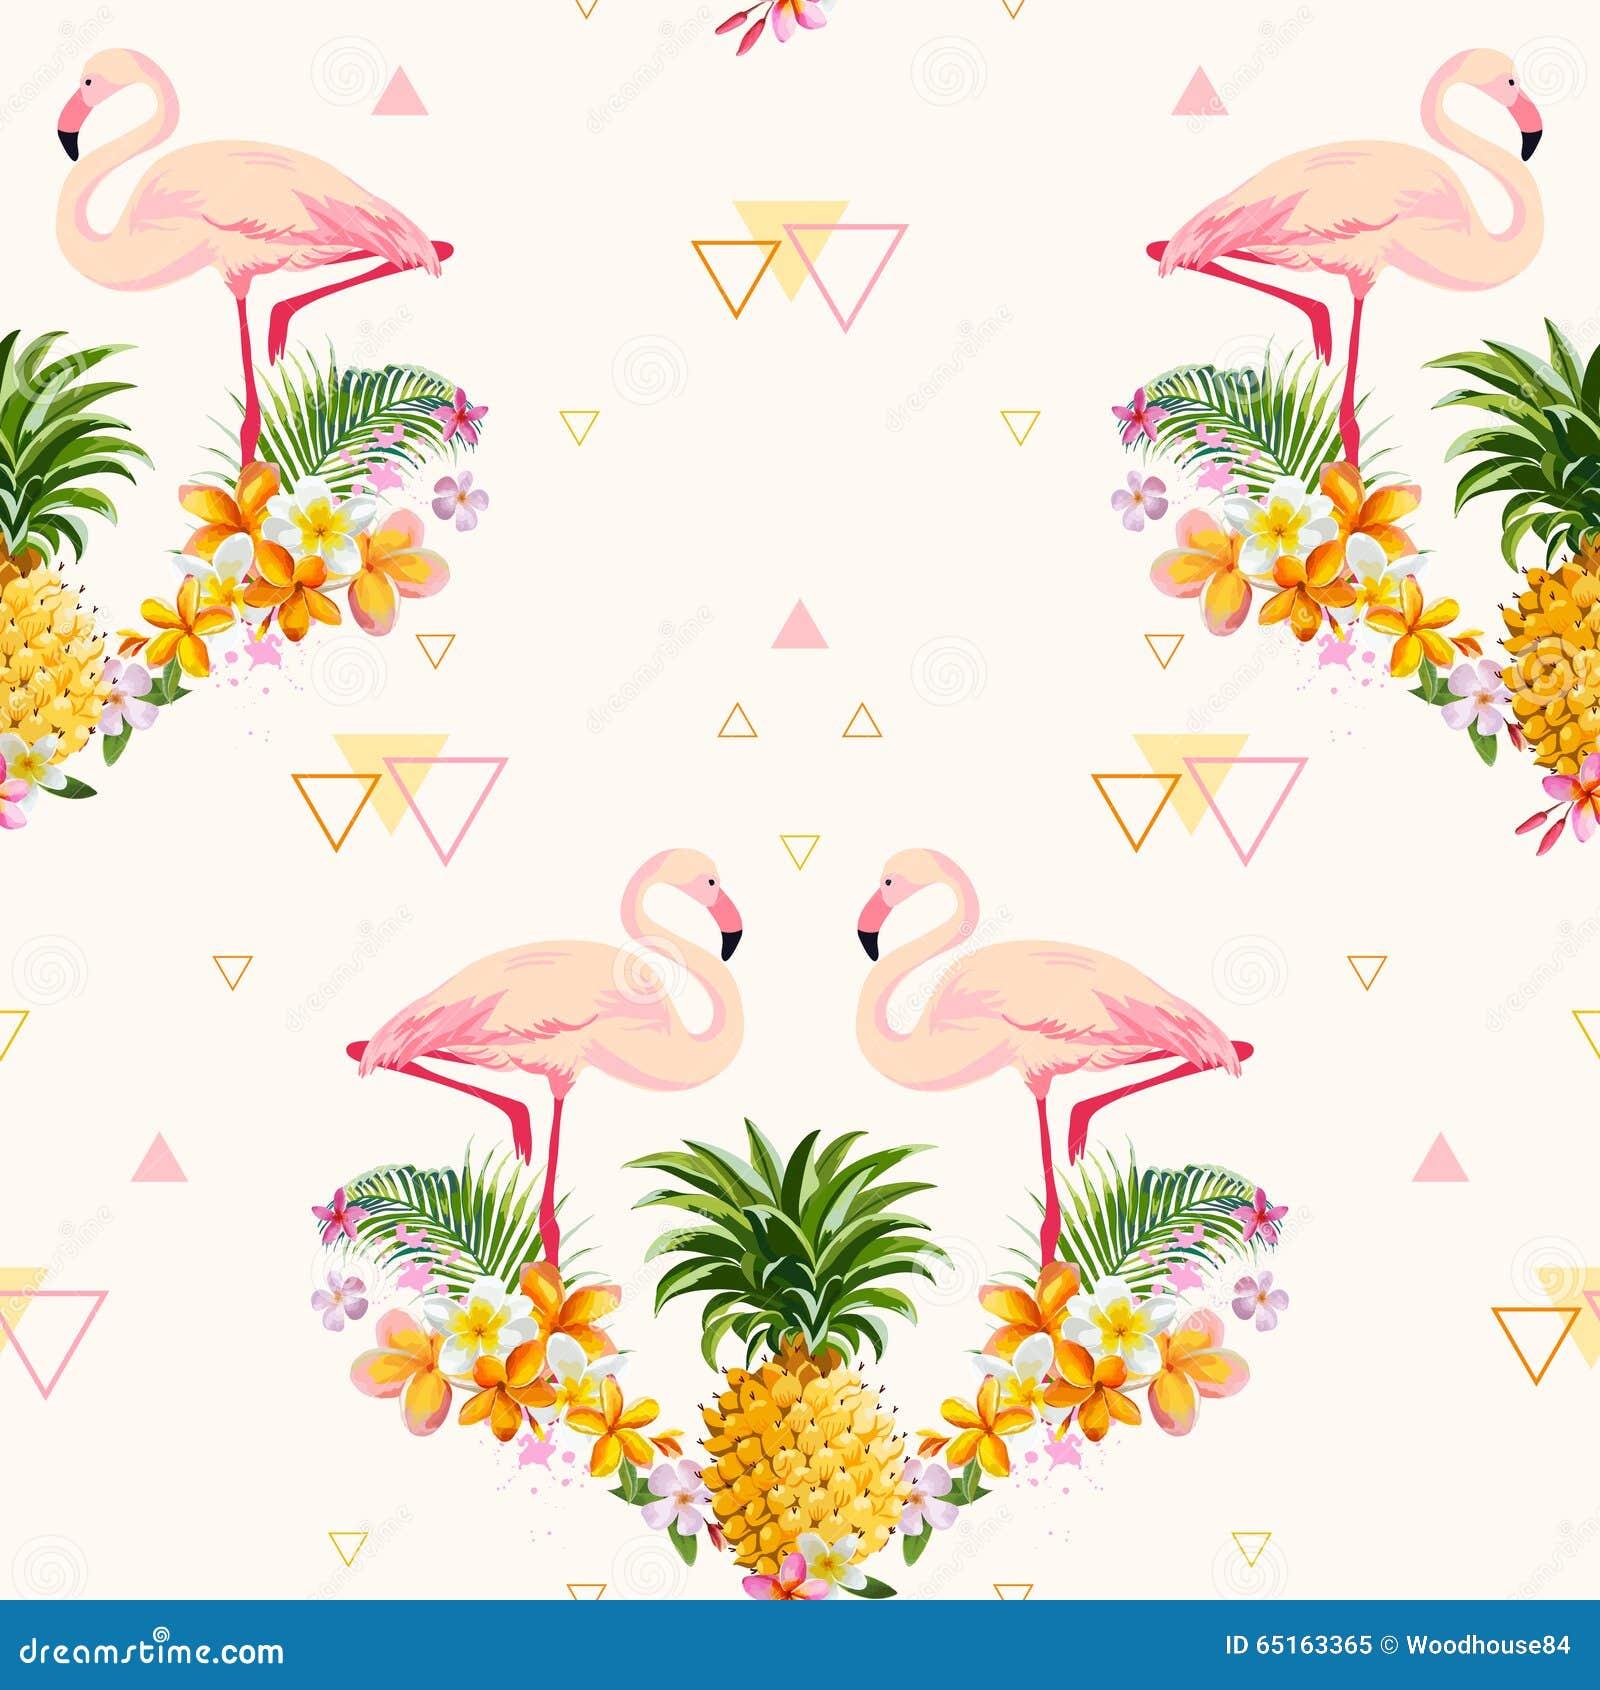 Love Bird Wedding Invitations with nice invitations layout